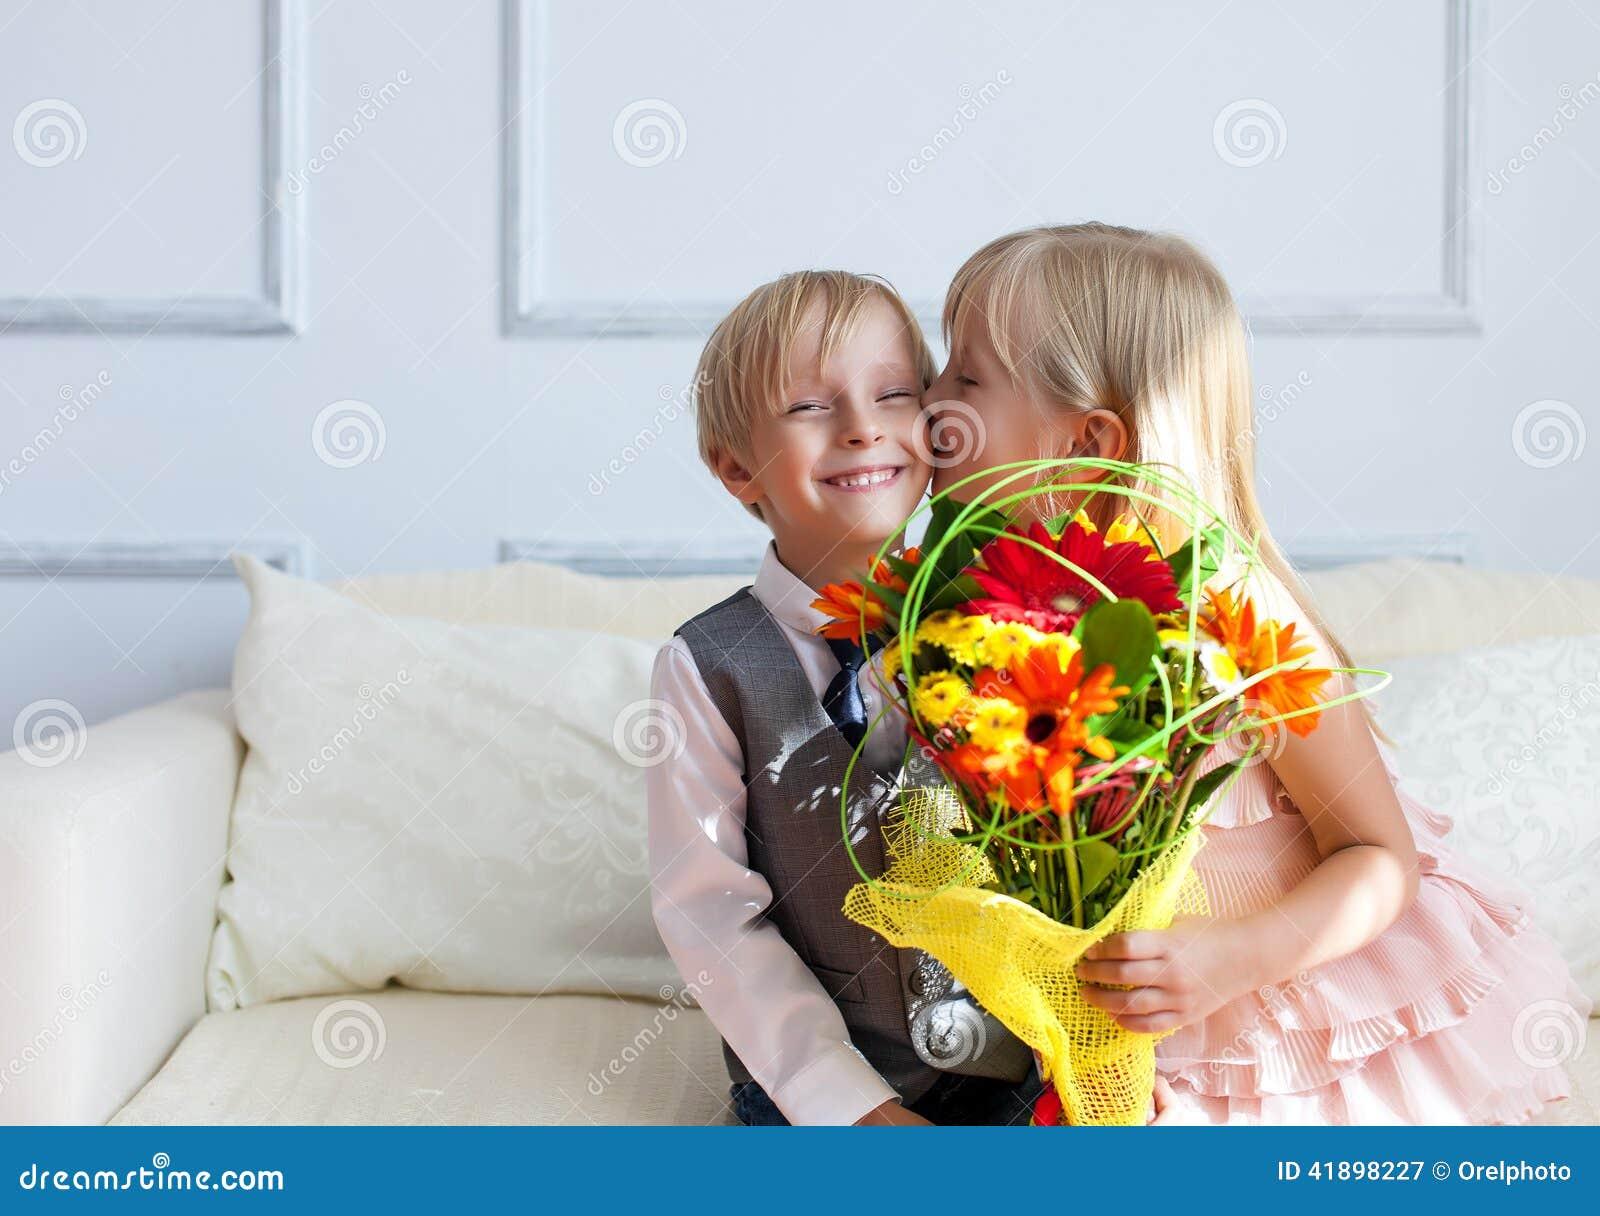 Fille nue embrasser un garçon